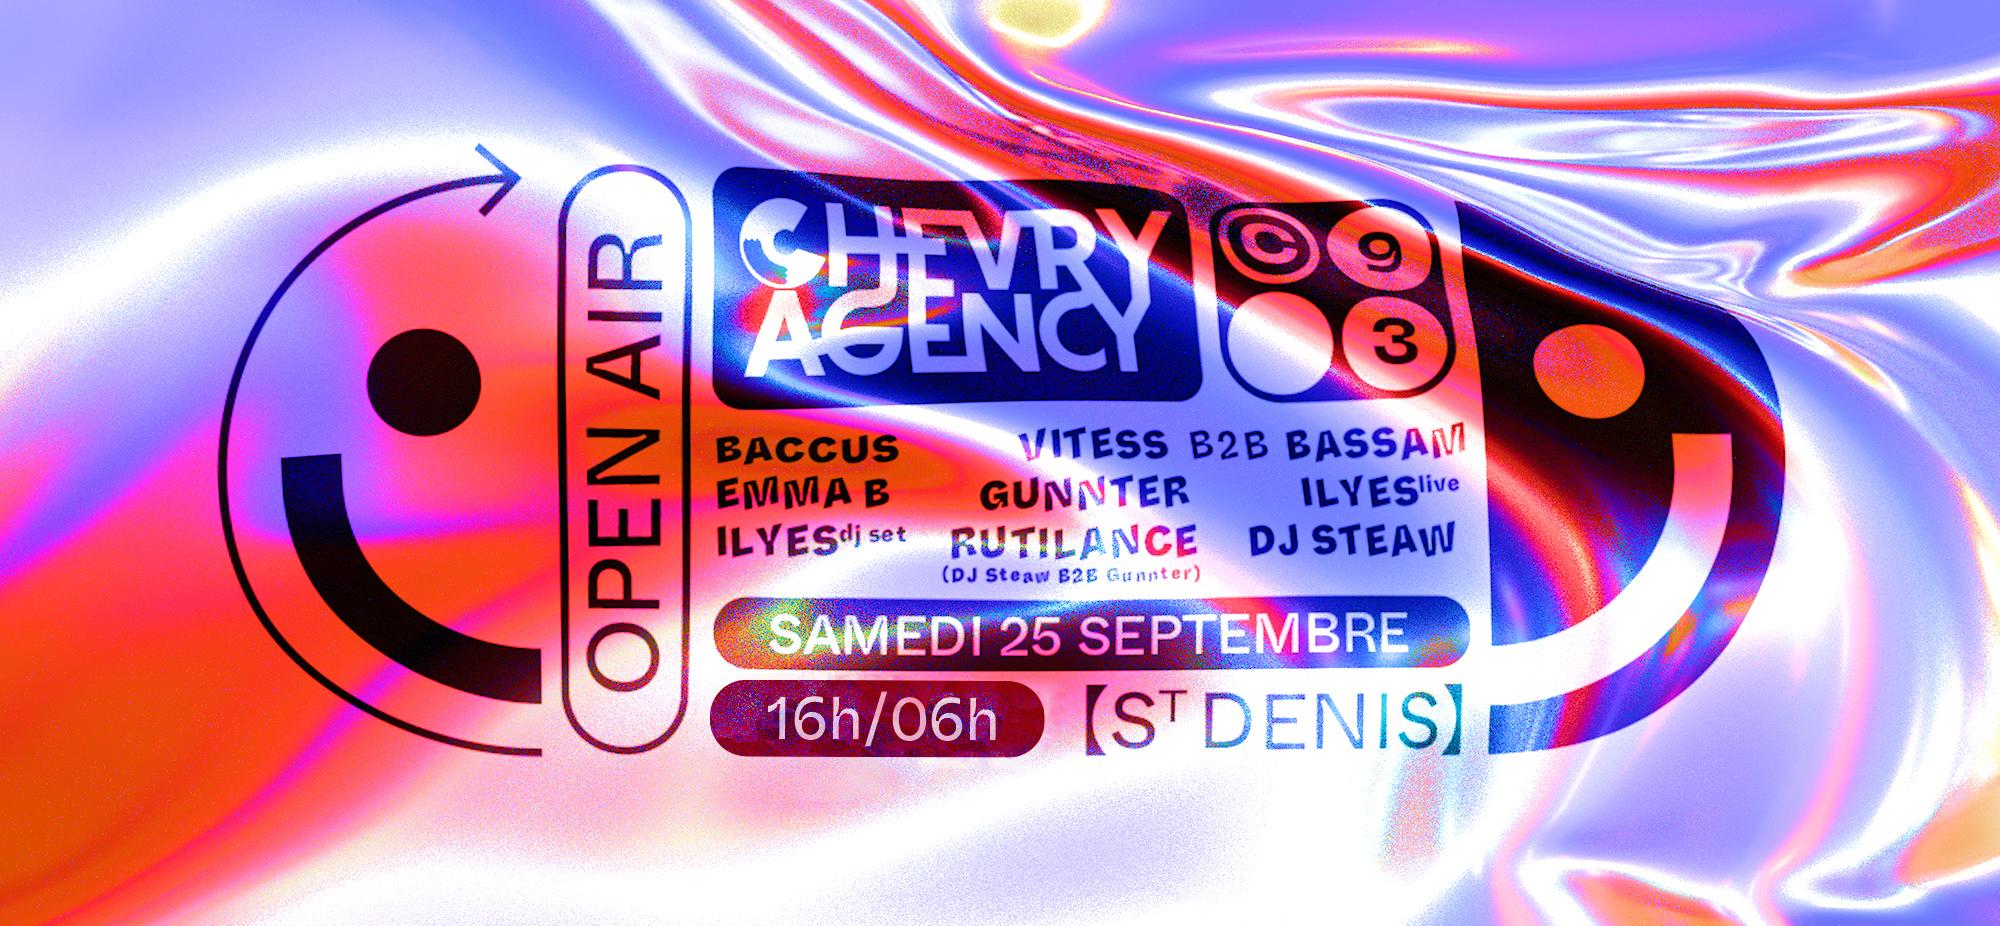 Chevry Agency x Centrale93 : DJ Steaw, Vitess b2b Bassam...